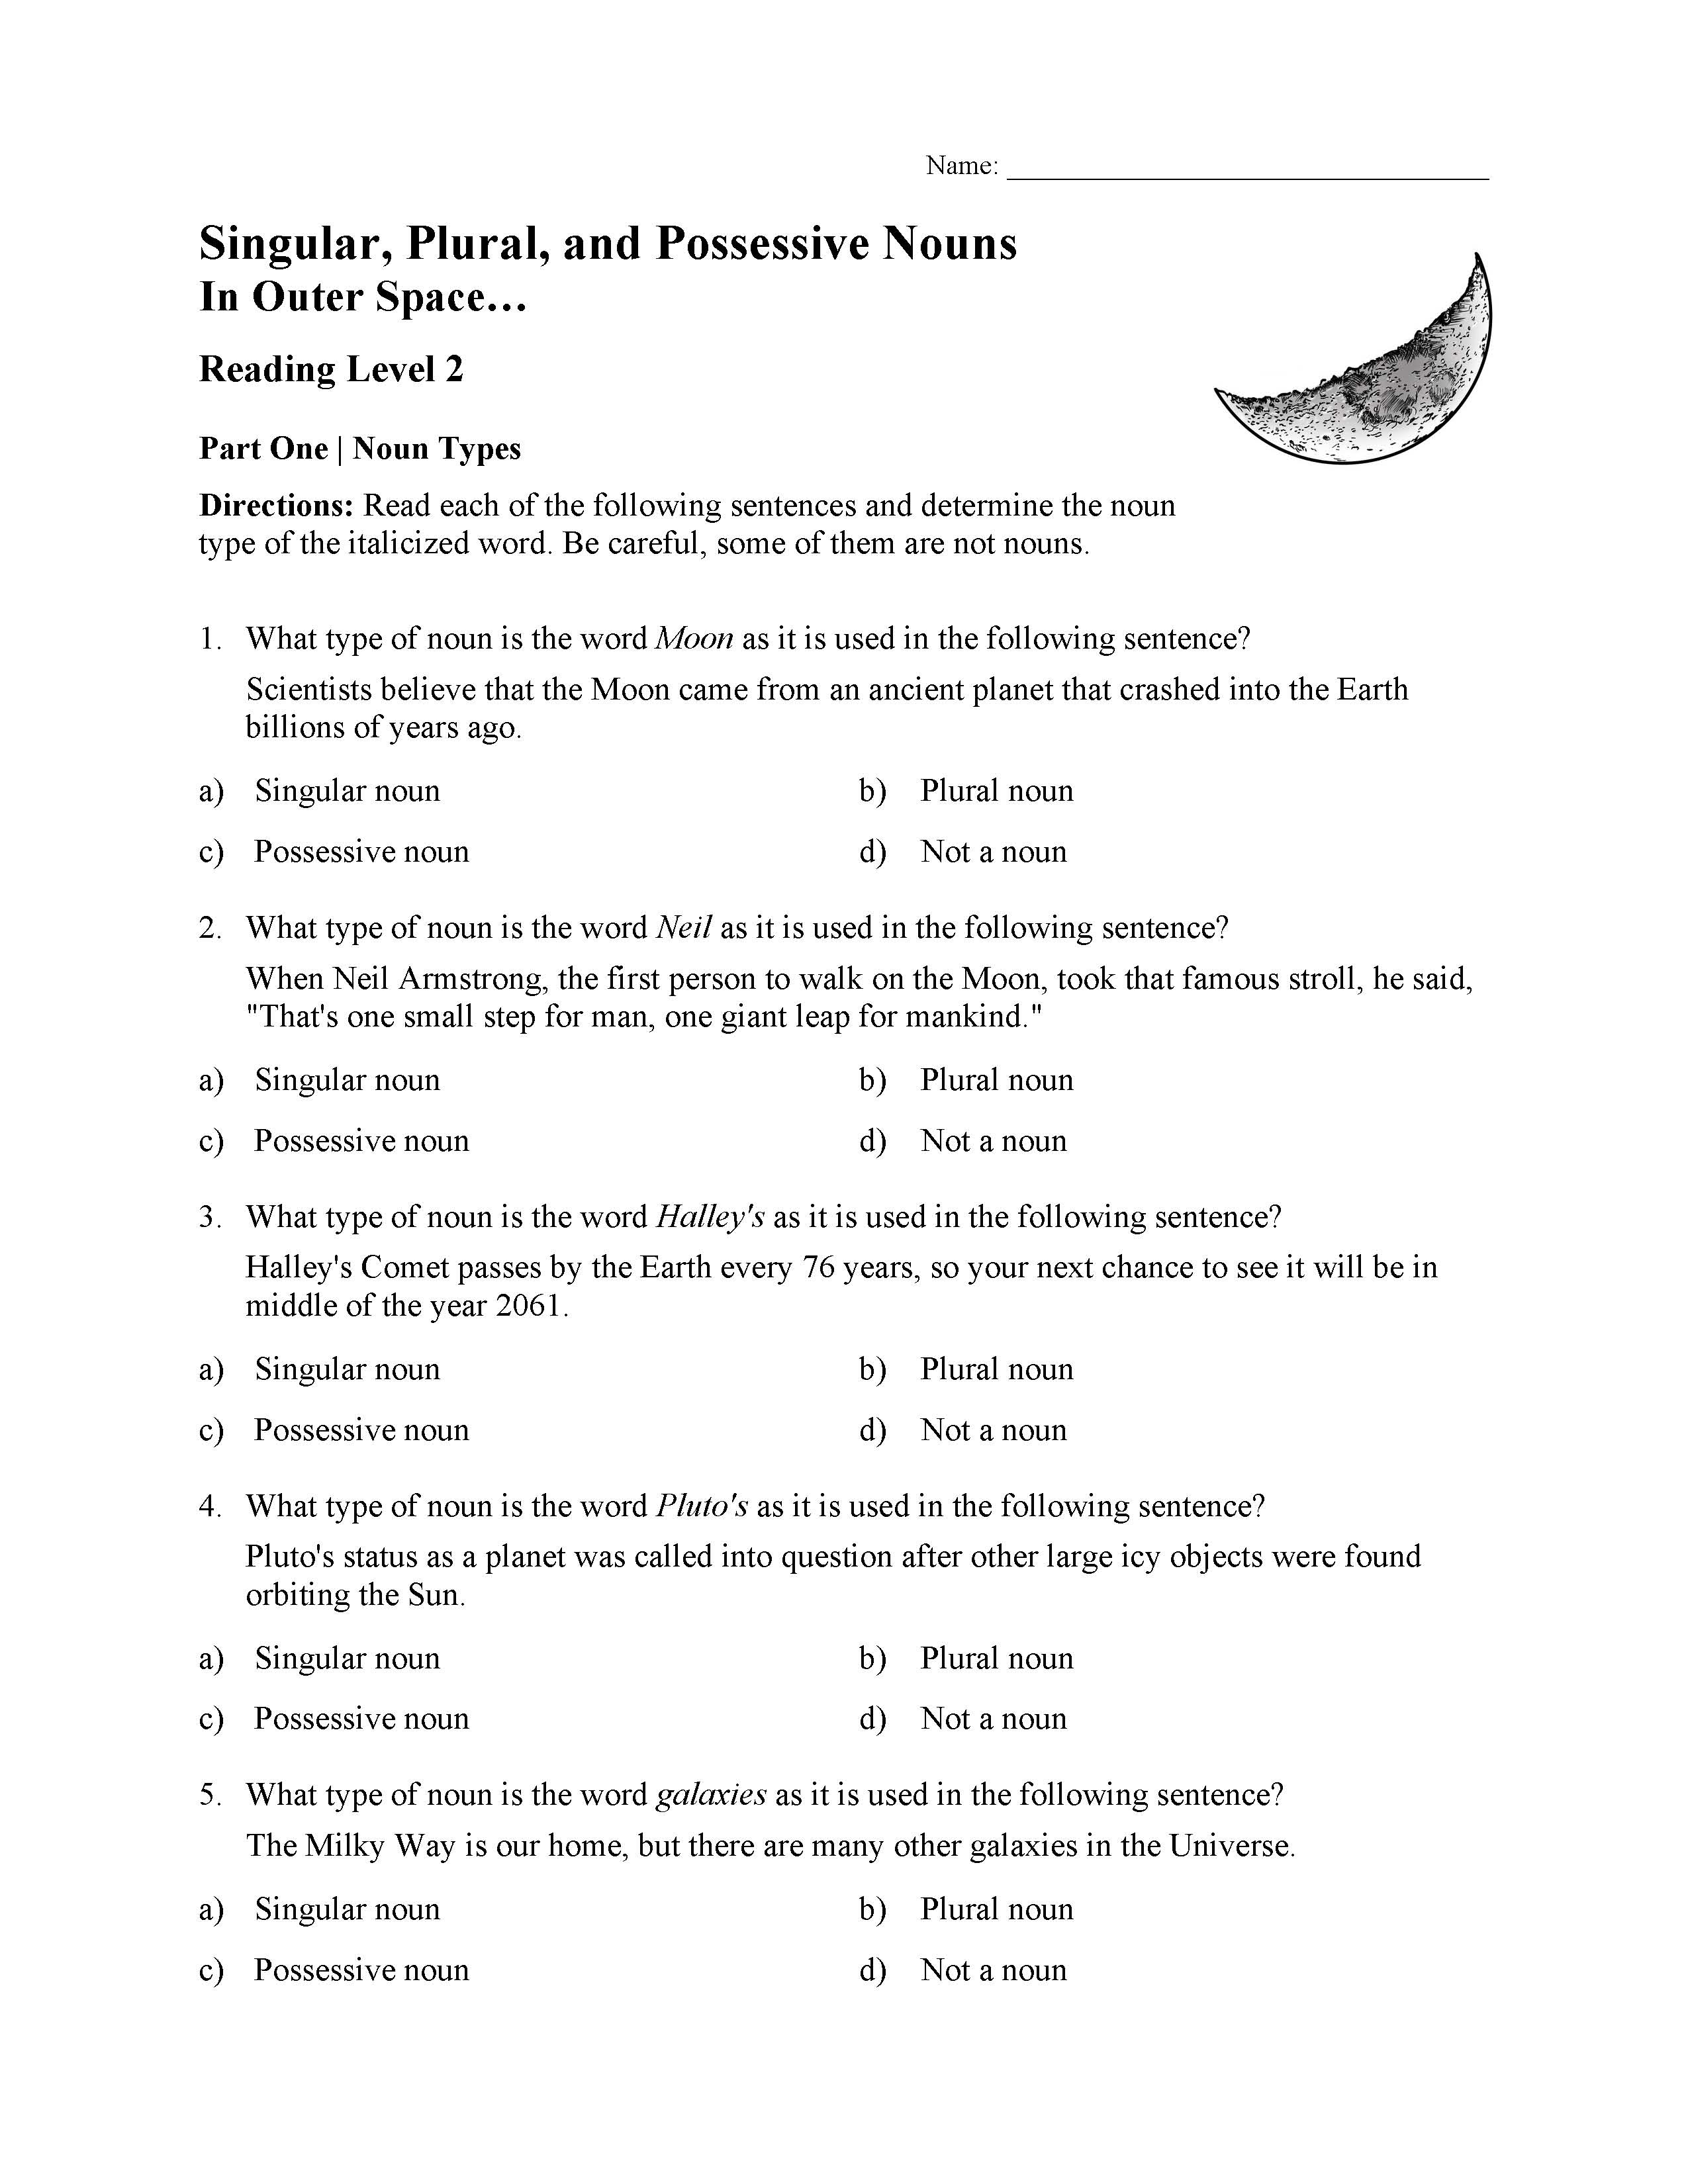 Singular Plural And Possessive Nouns Test 2